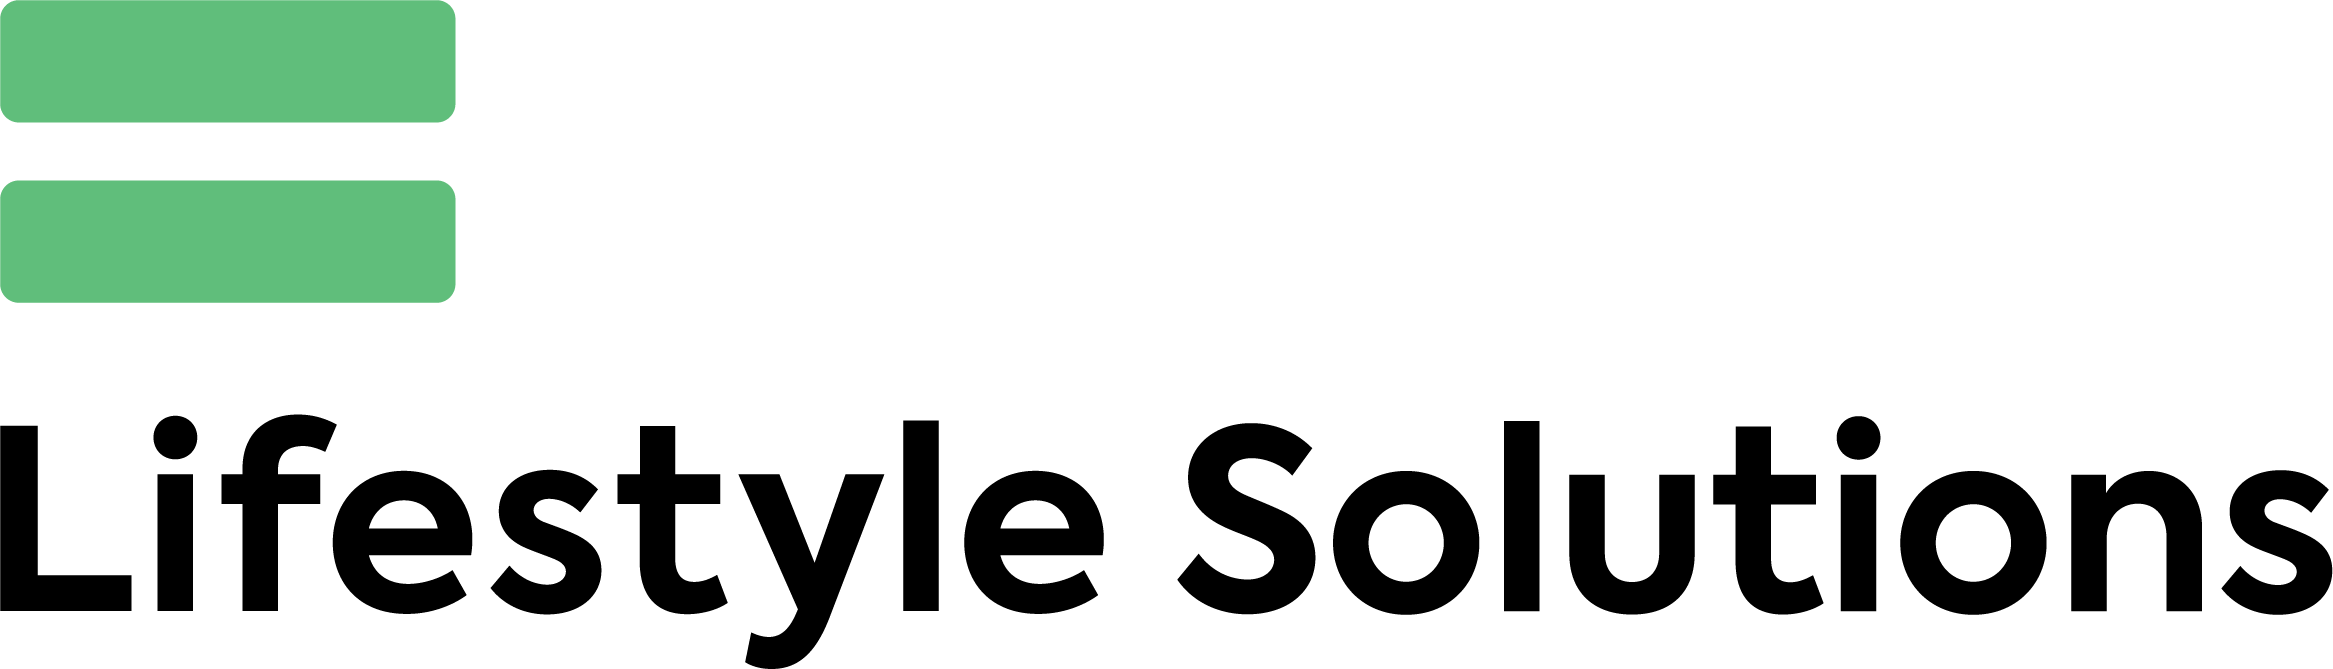 lfs_logo_horizontal_rgb.png